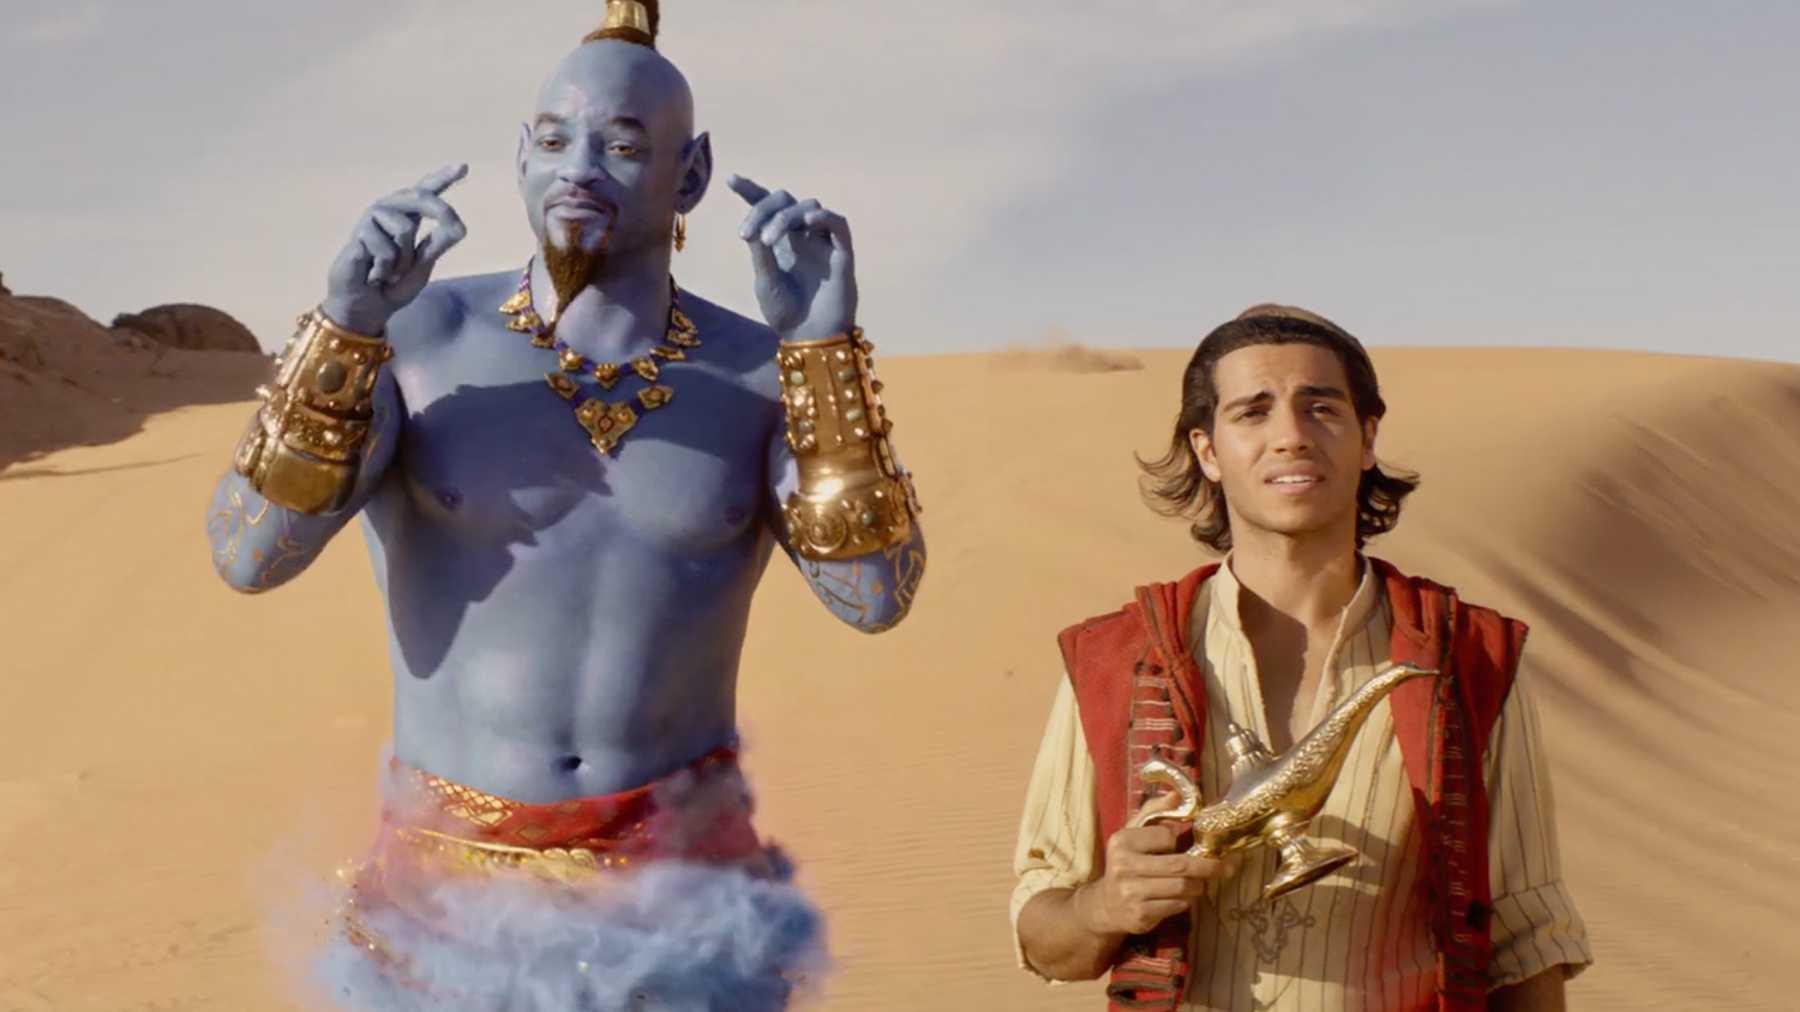 Aladdin 2019 Surpasses The Billion Dollar Mark At The Box Office Mxdwn Movies